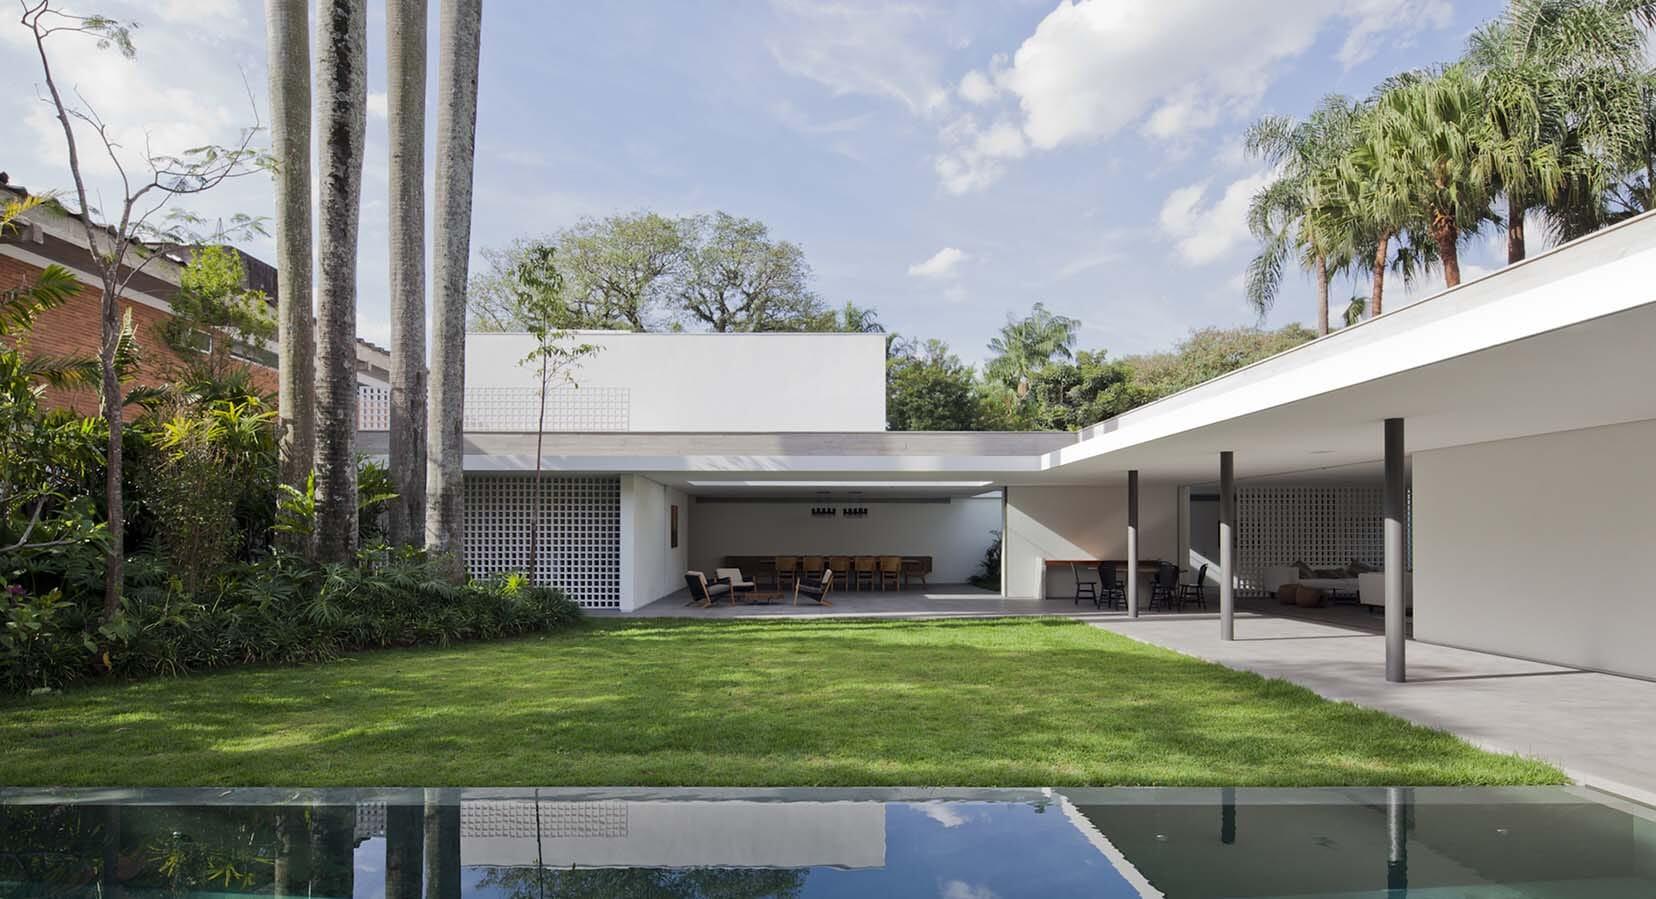 A Haven Of Light And Greenery: Step Inside The Alto de Pinheiros House, Brazil